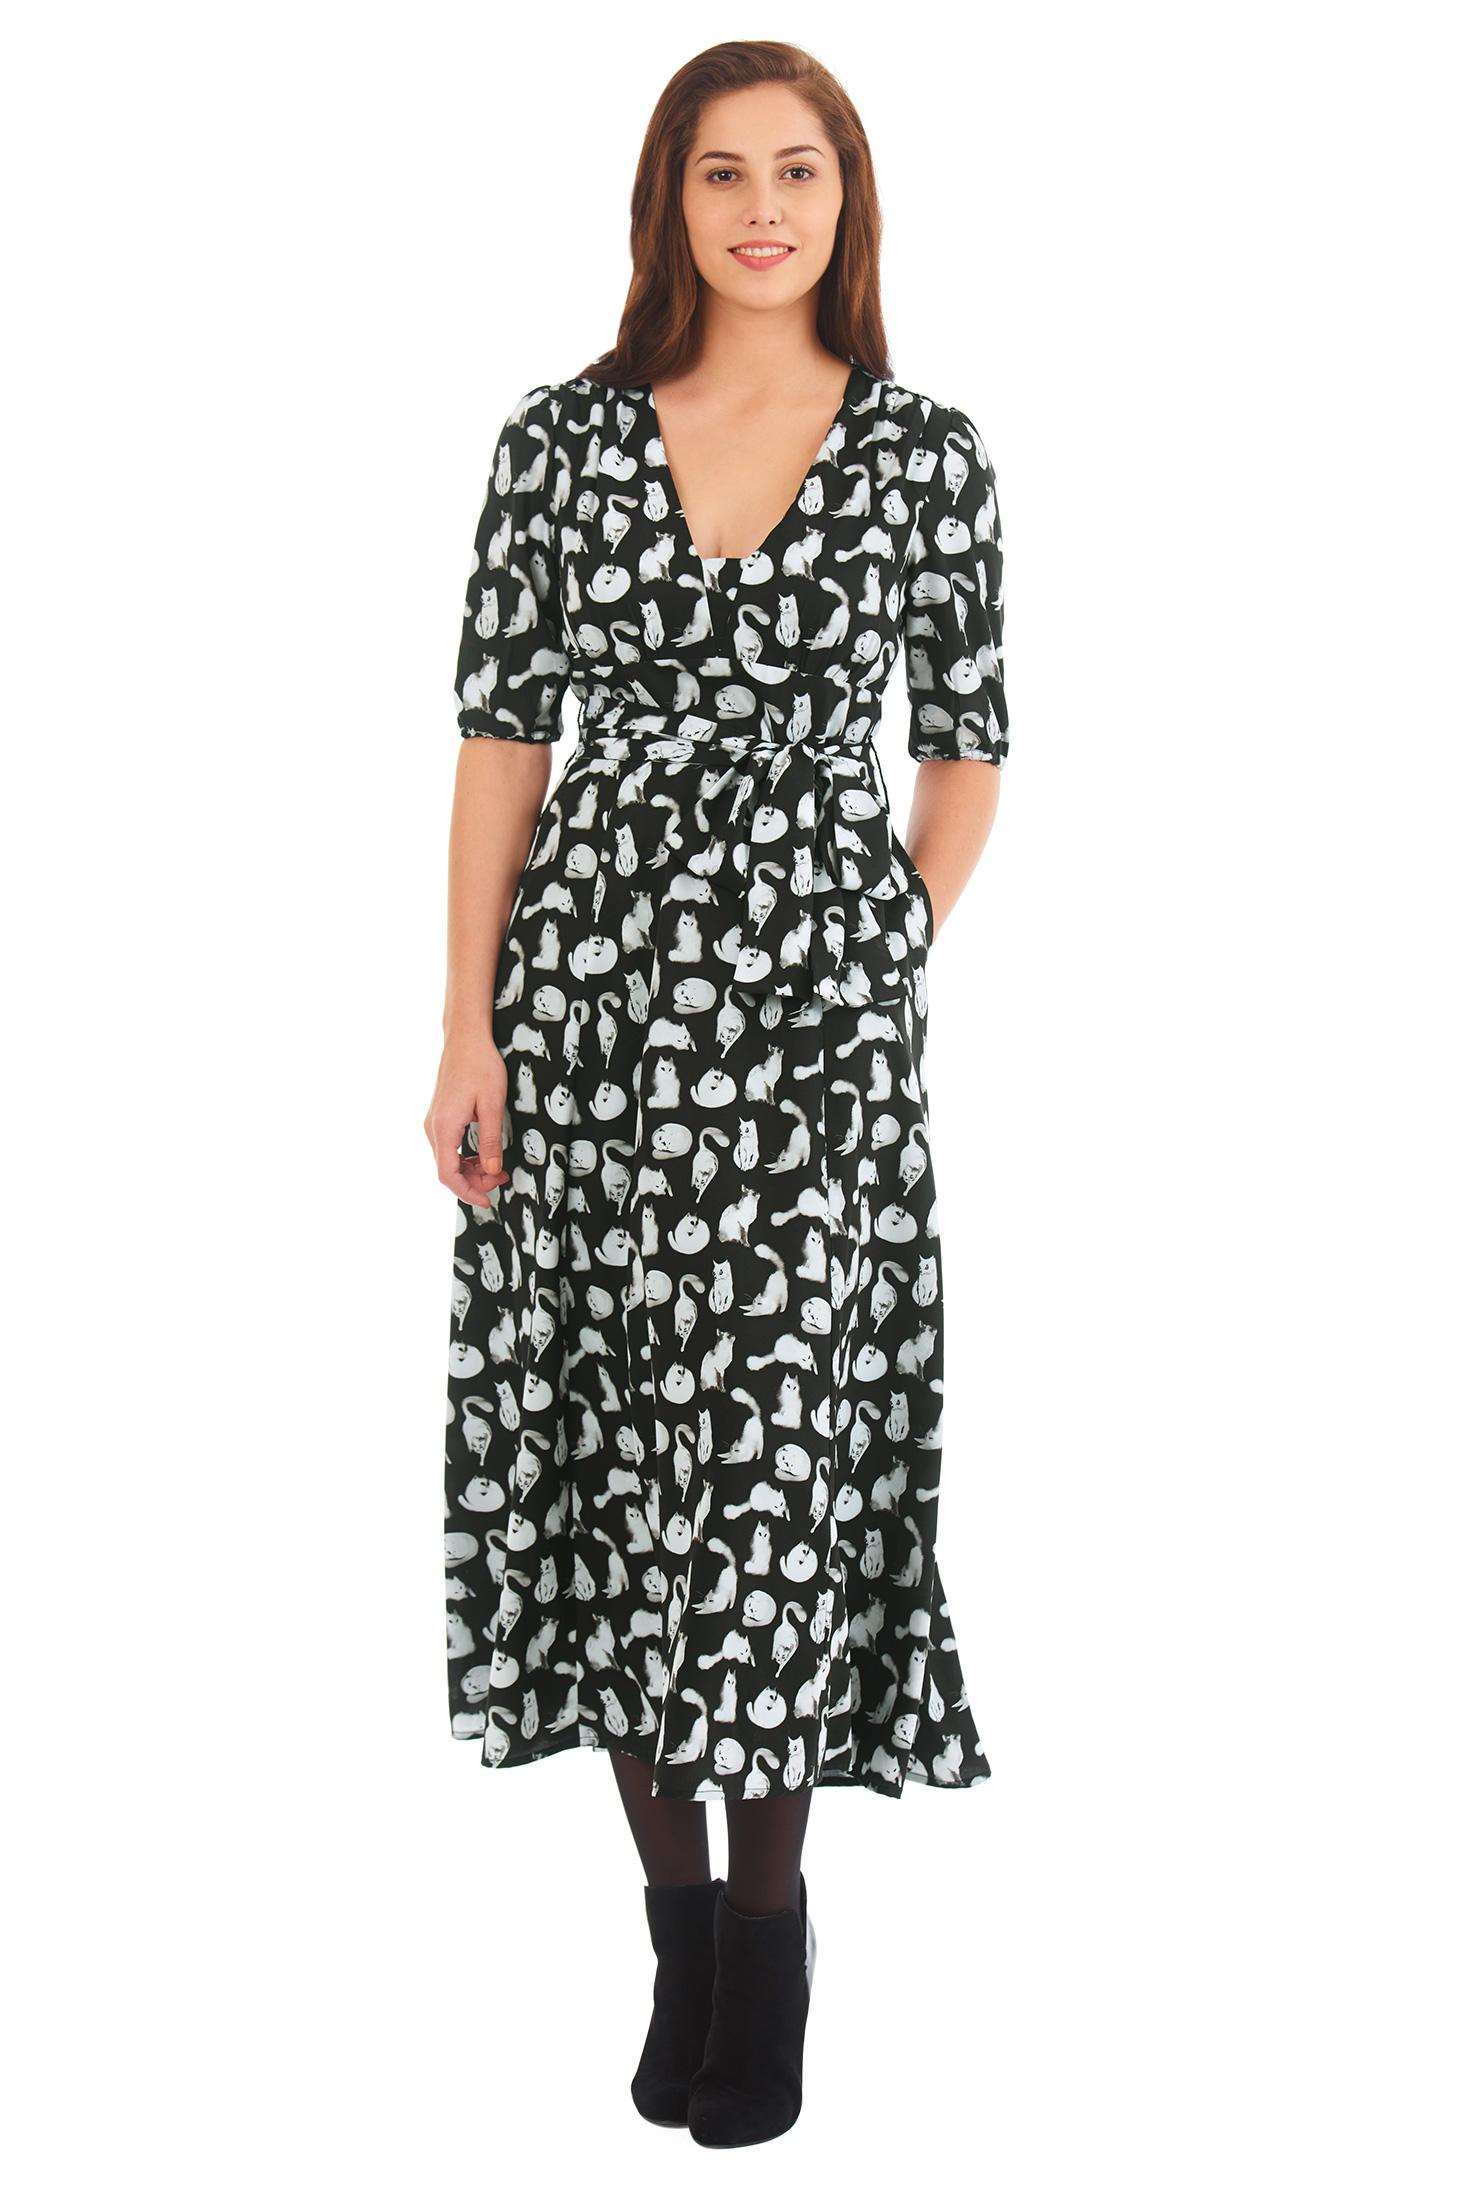 Black and White Print Dress